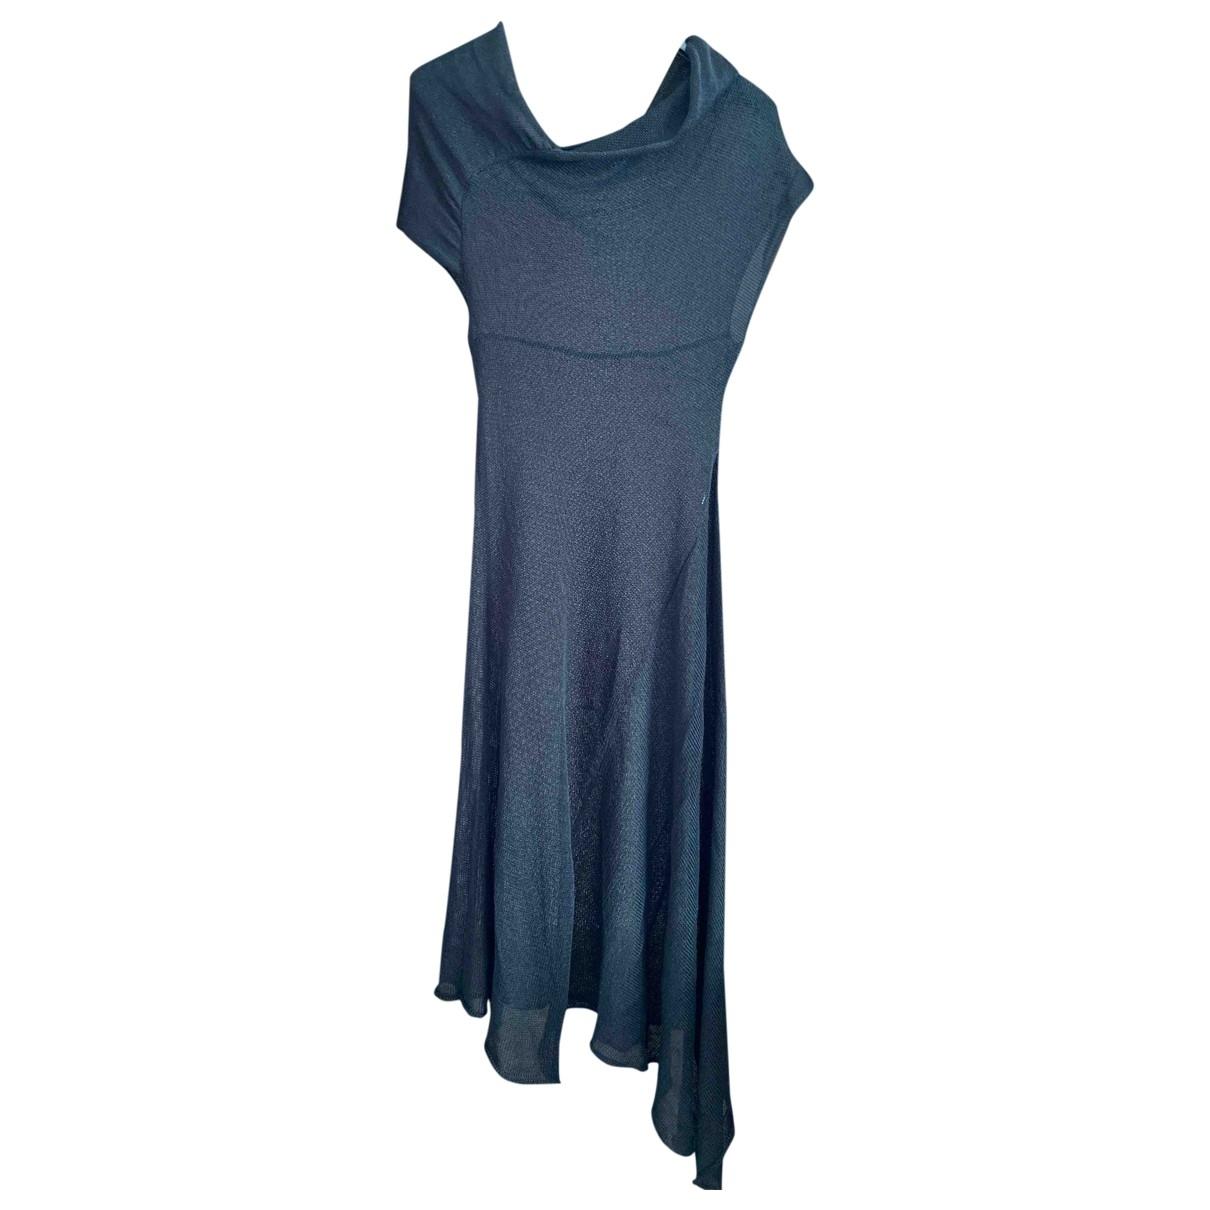 Alessandra Marchi \N Black Cotton dress for Women M International